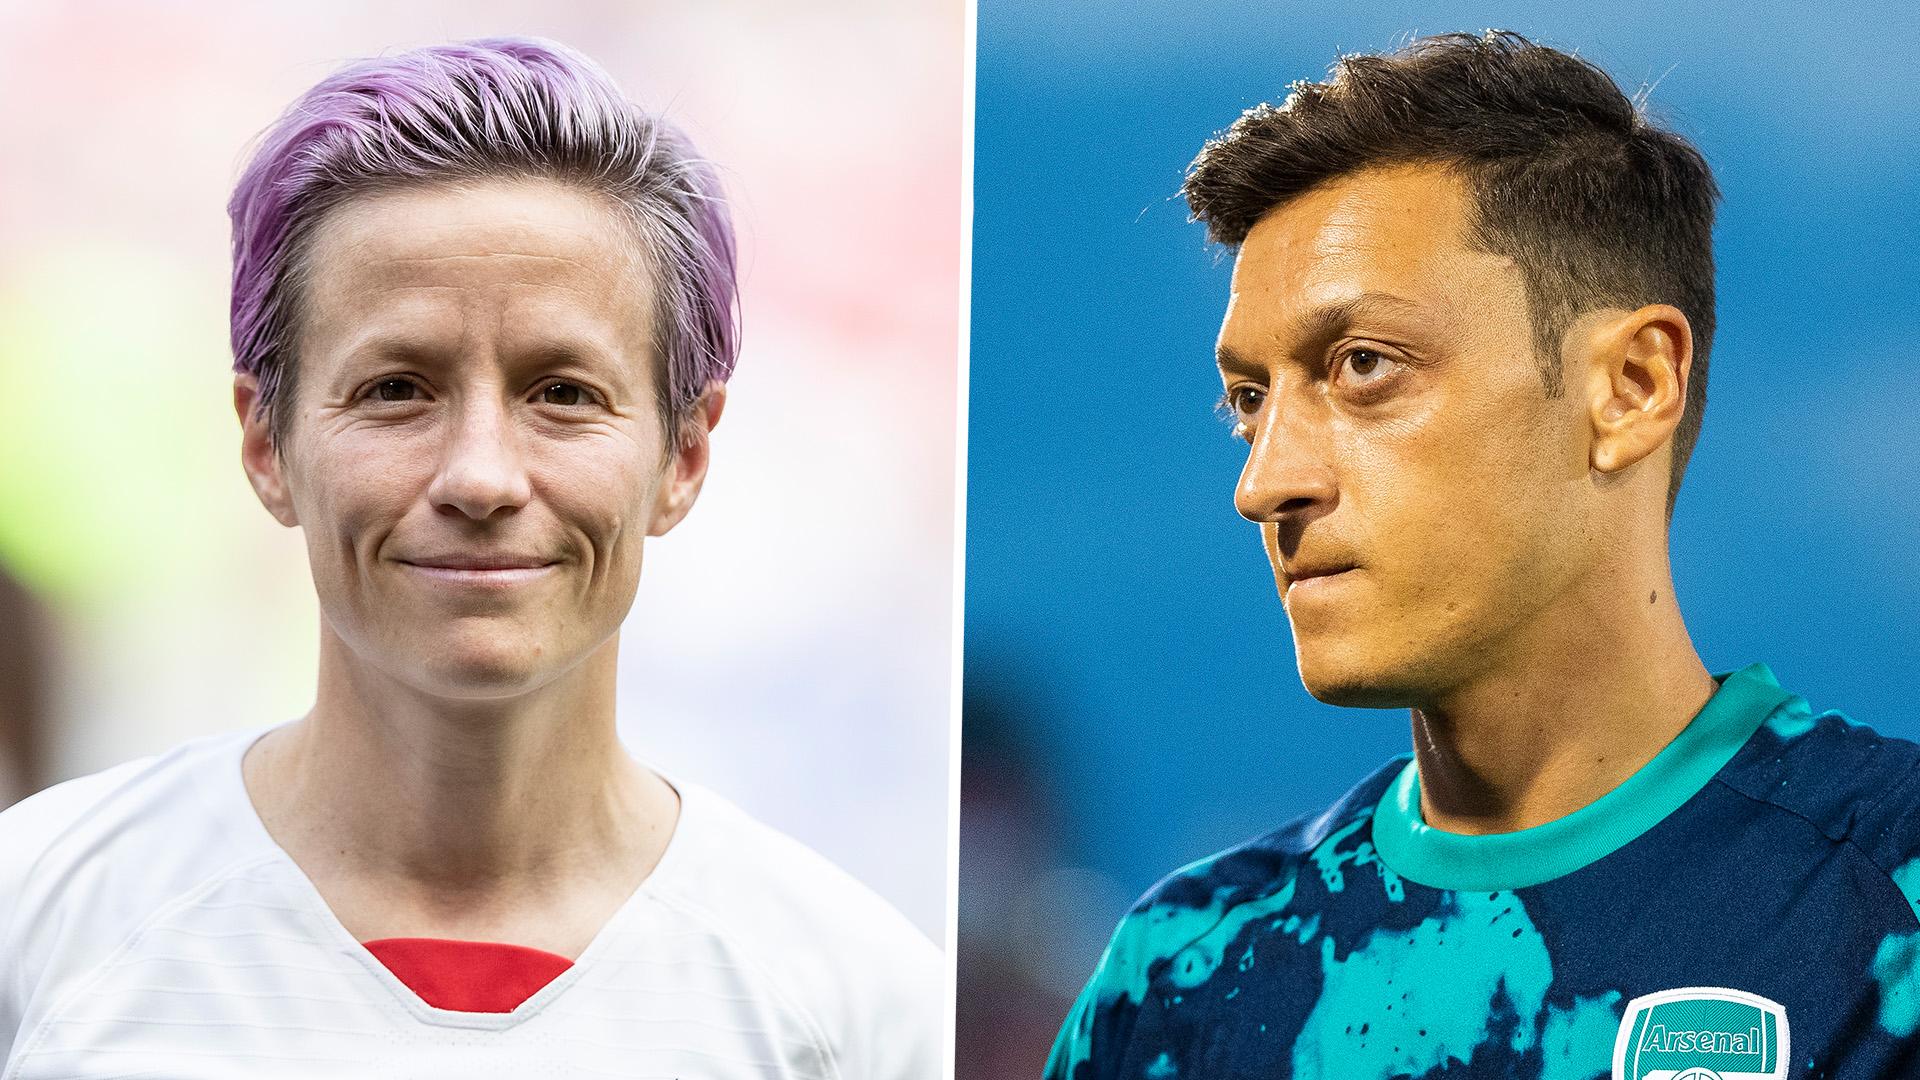 Aubameyang jokes Ozil looks like Megan Rapinoe as he reveals his new bleach blonde hairstyle